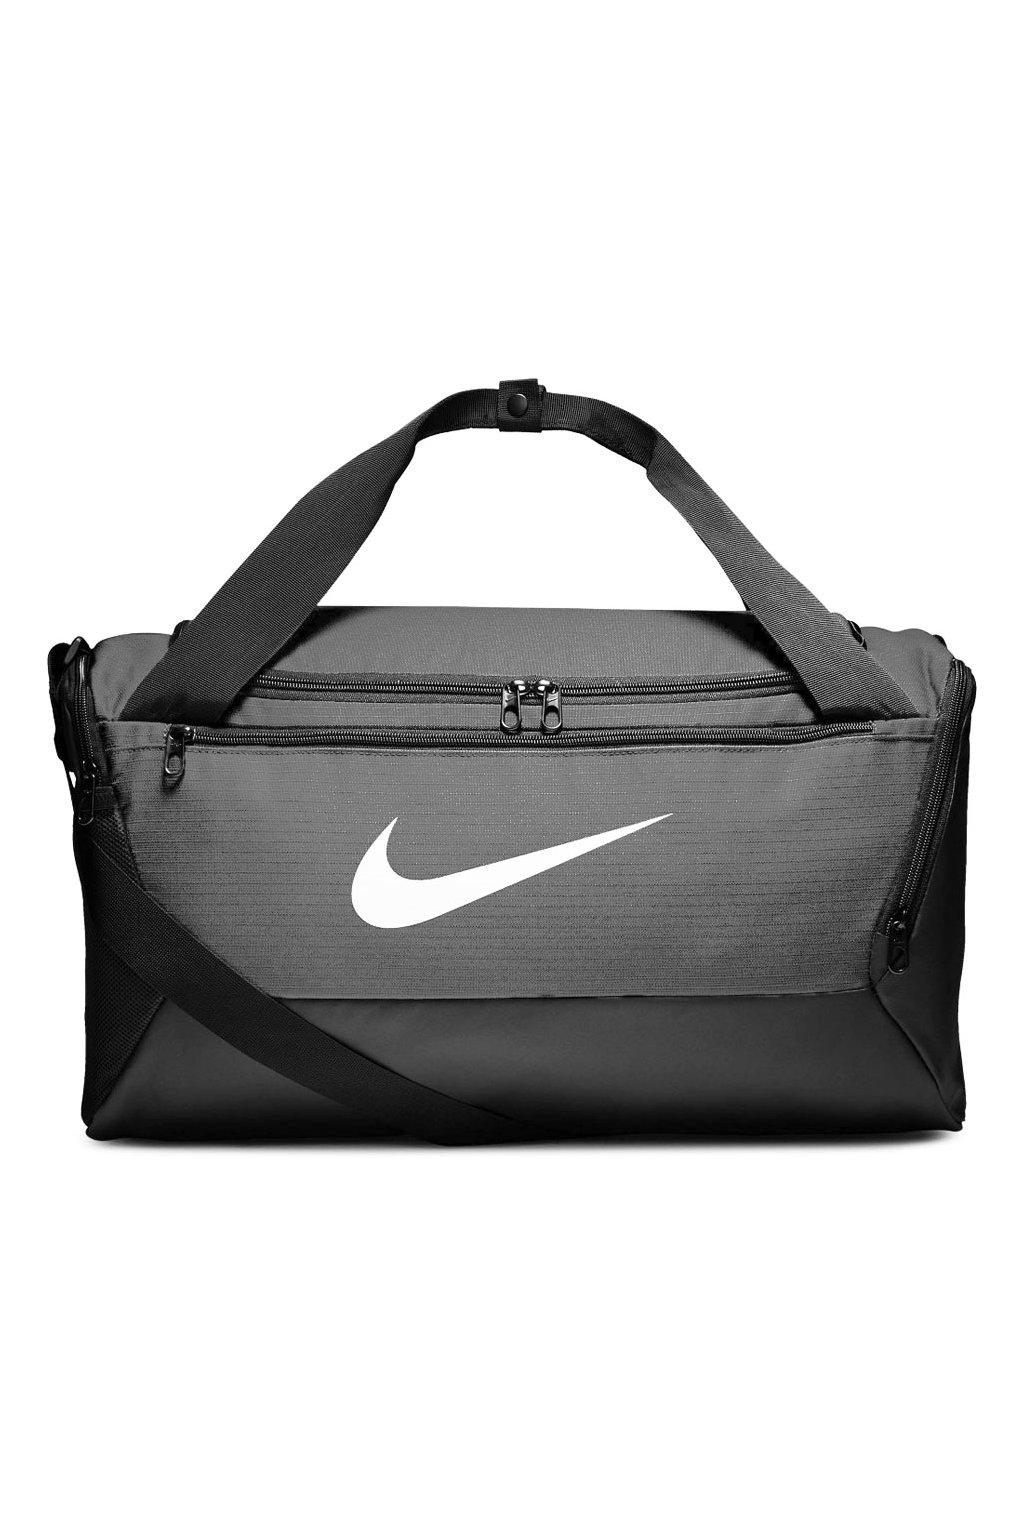 Taška Nike Brasilia S Duffel 9.0 sivá BA5957 026